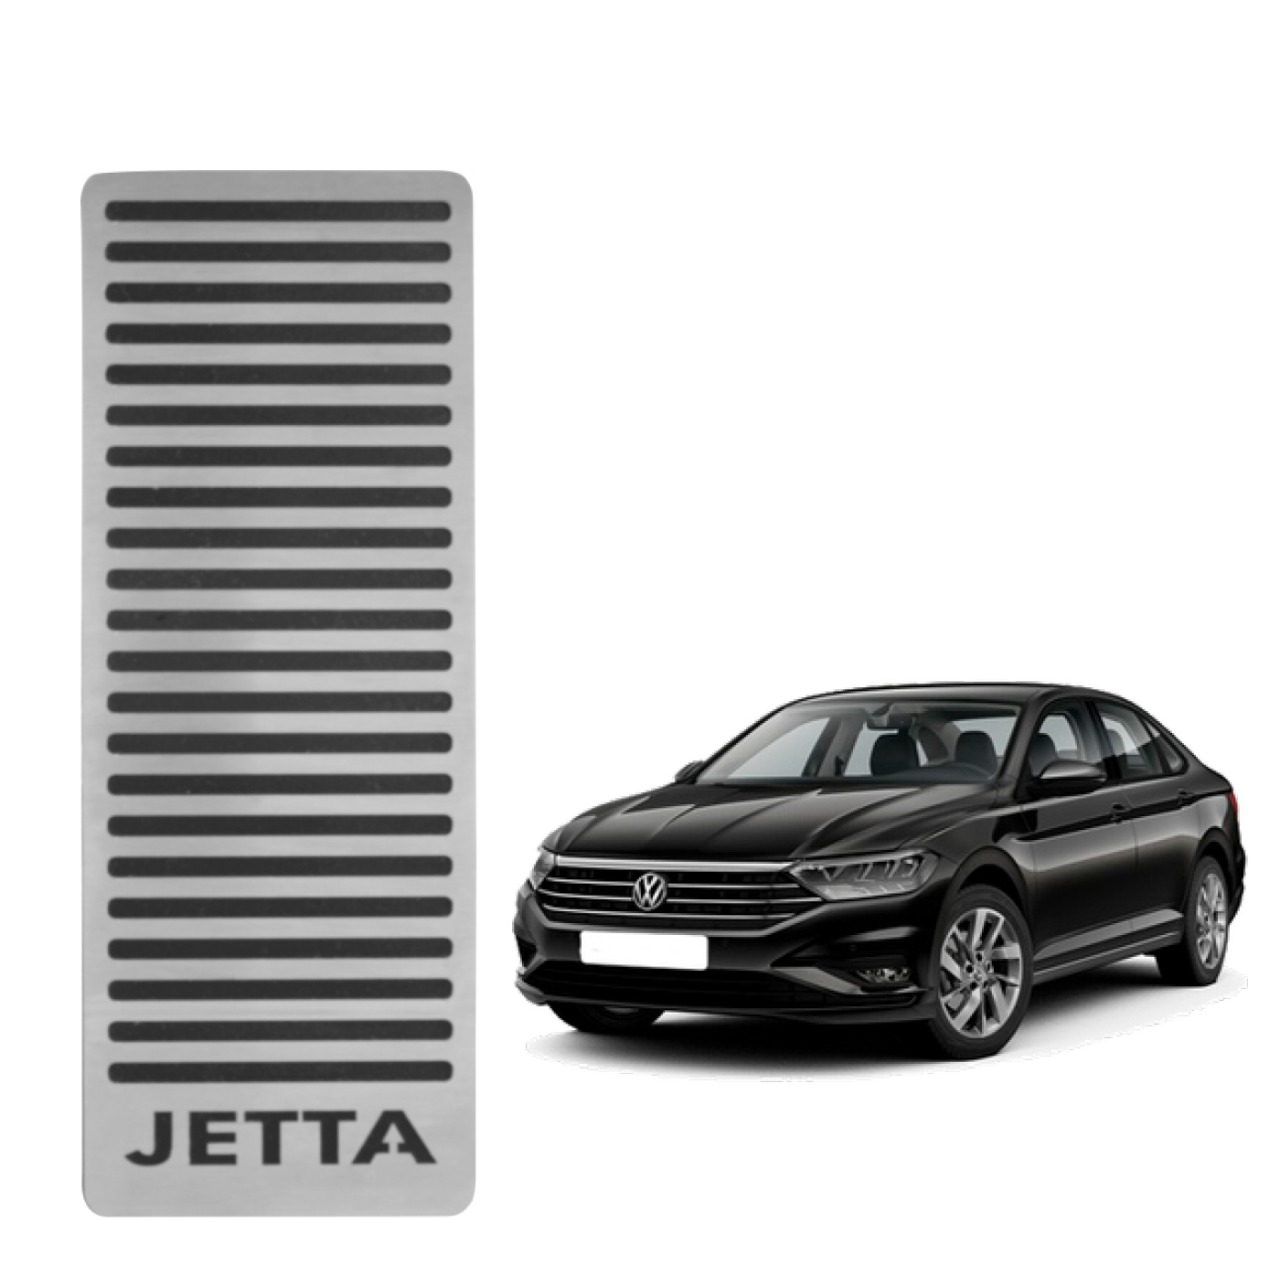 Descanso de Pé Volkswagen Jetta 2019 em diante Aço Inox Escovado